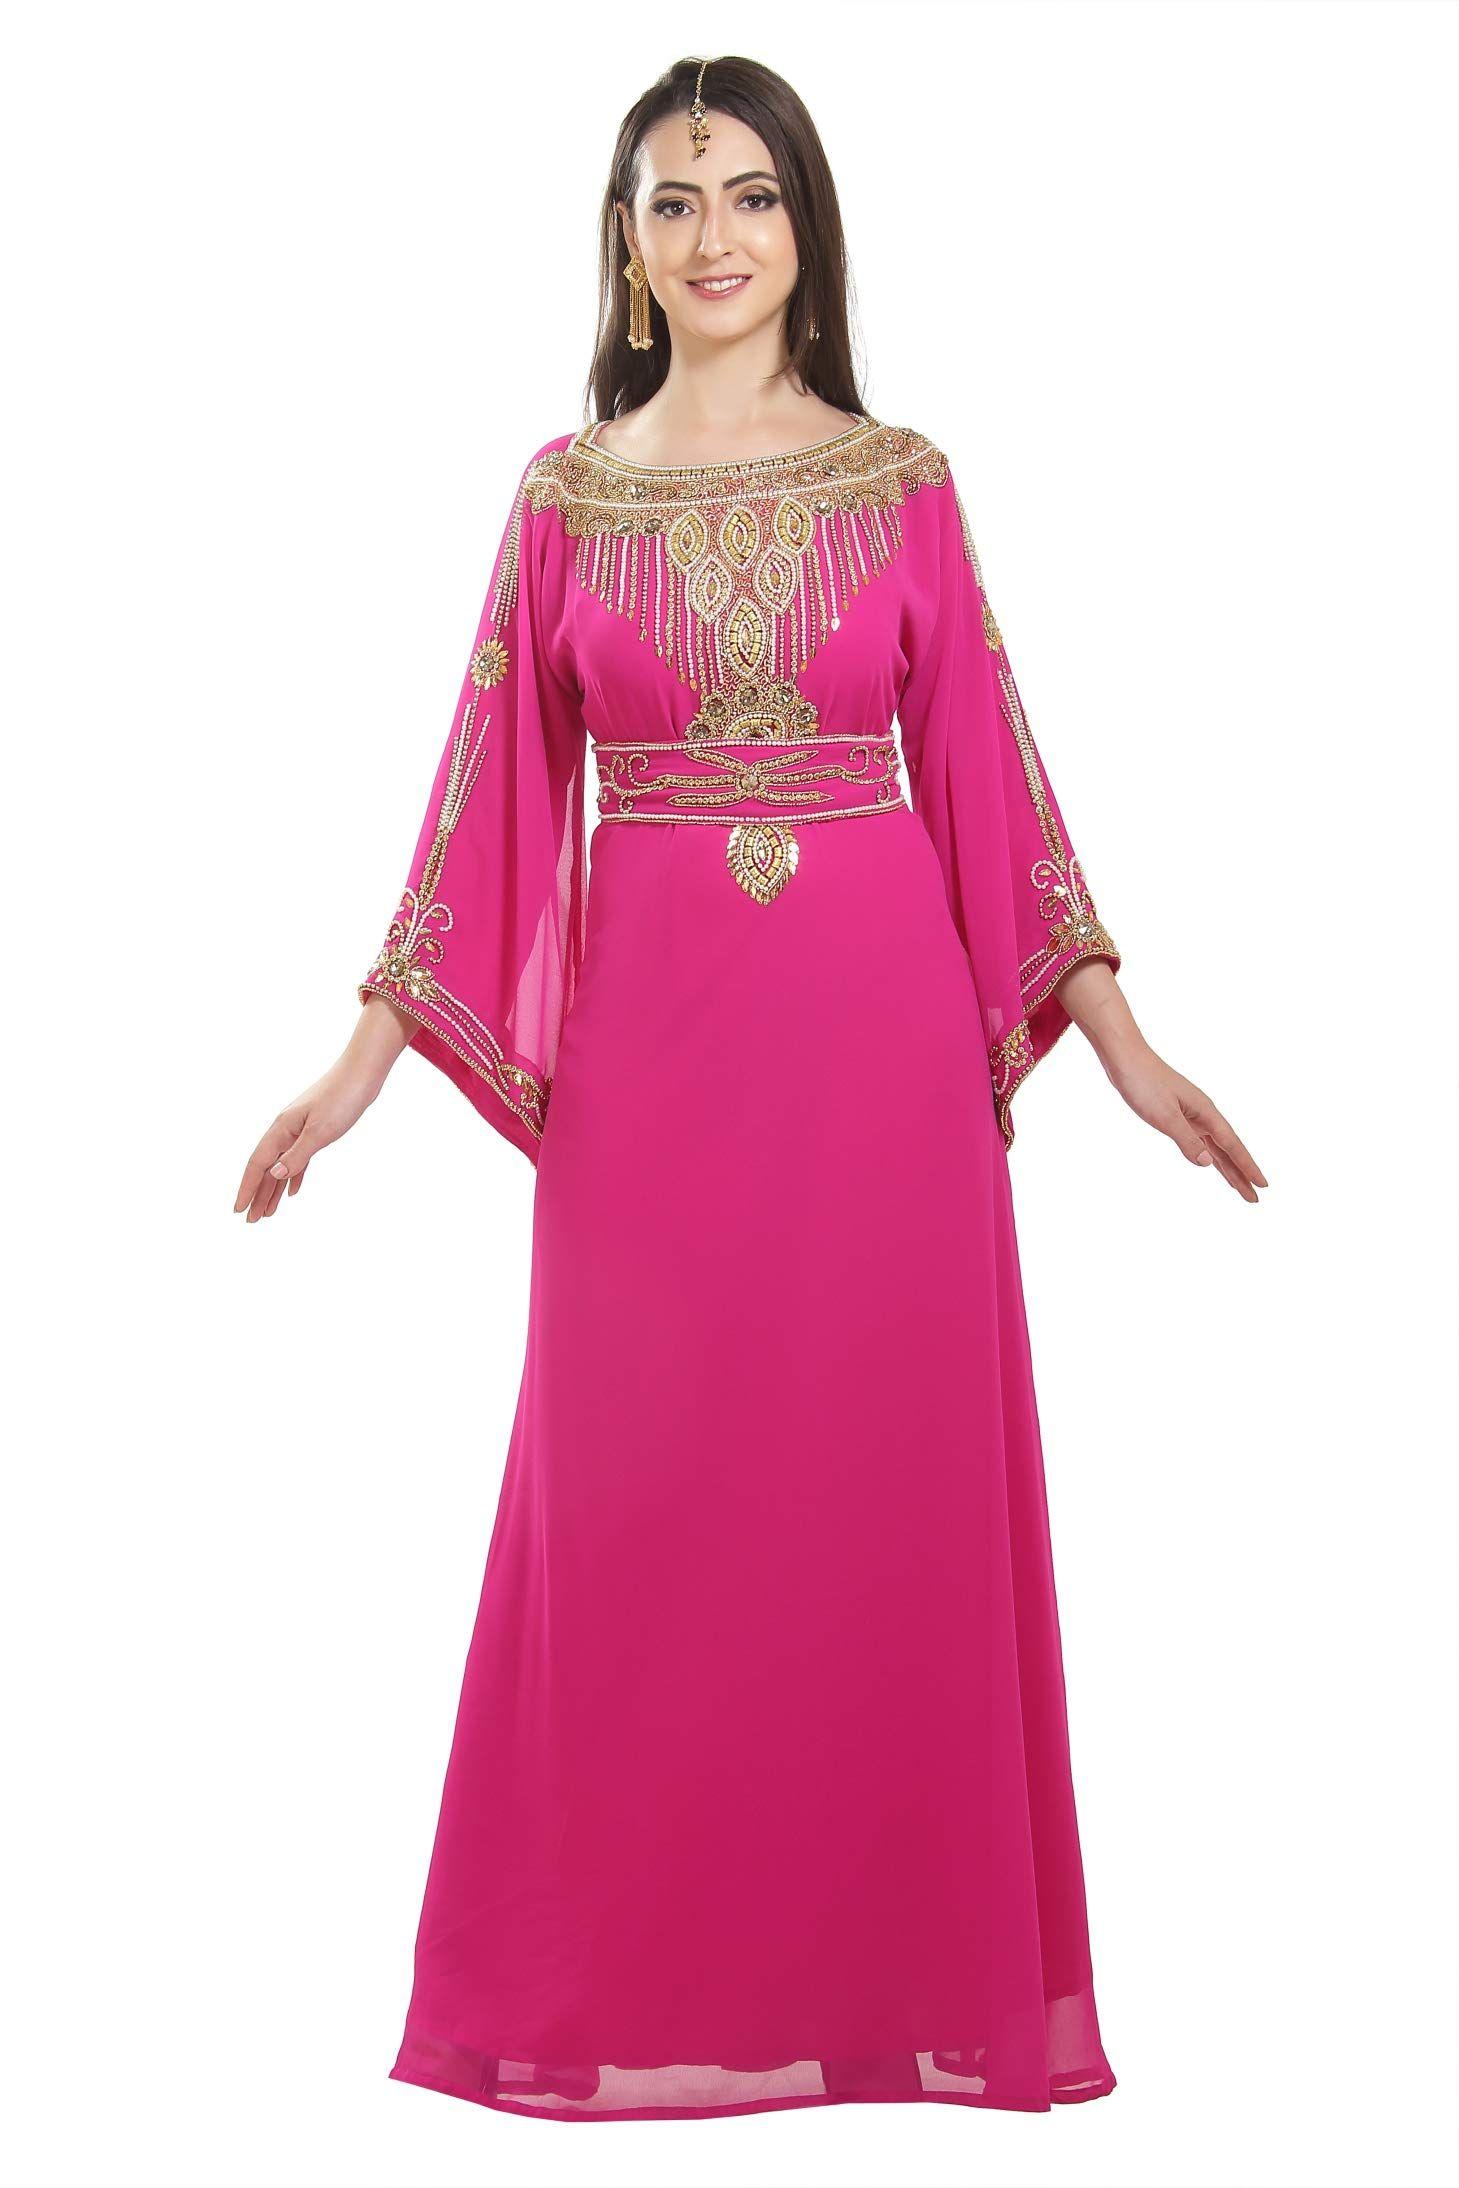 e4b977b40 Genie Aladdin Fancy Maxi Dress Evening Wear Night Gown for Arabian Ladies  7170